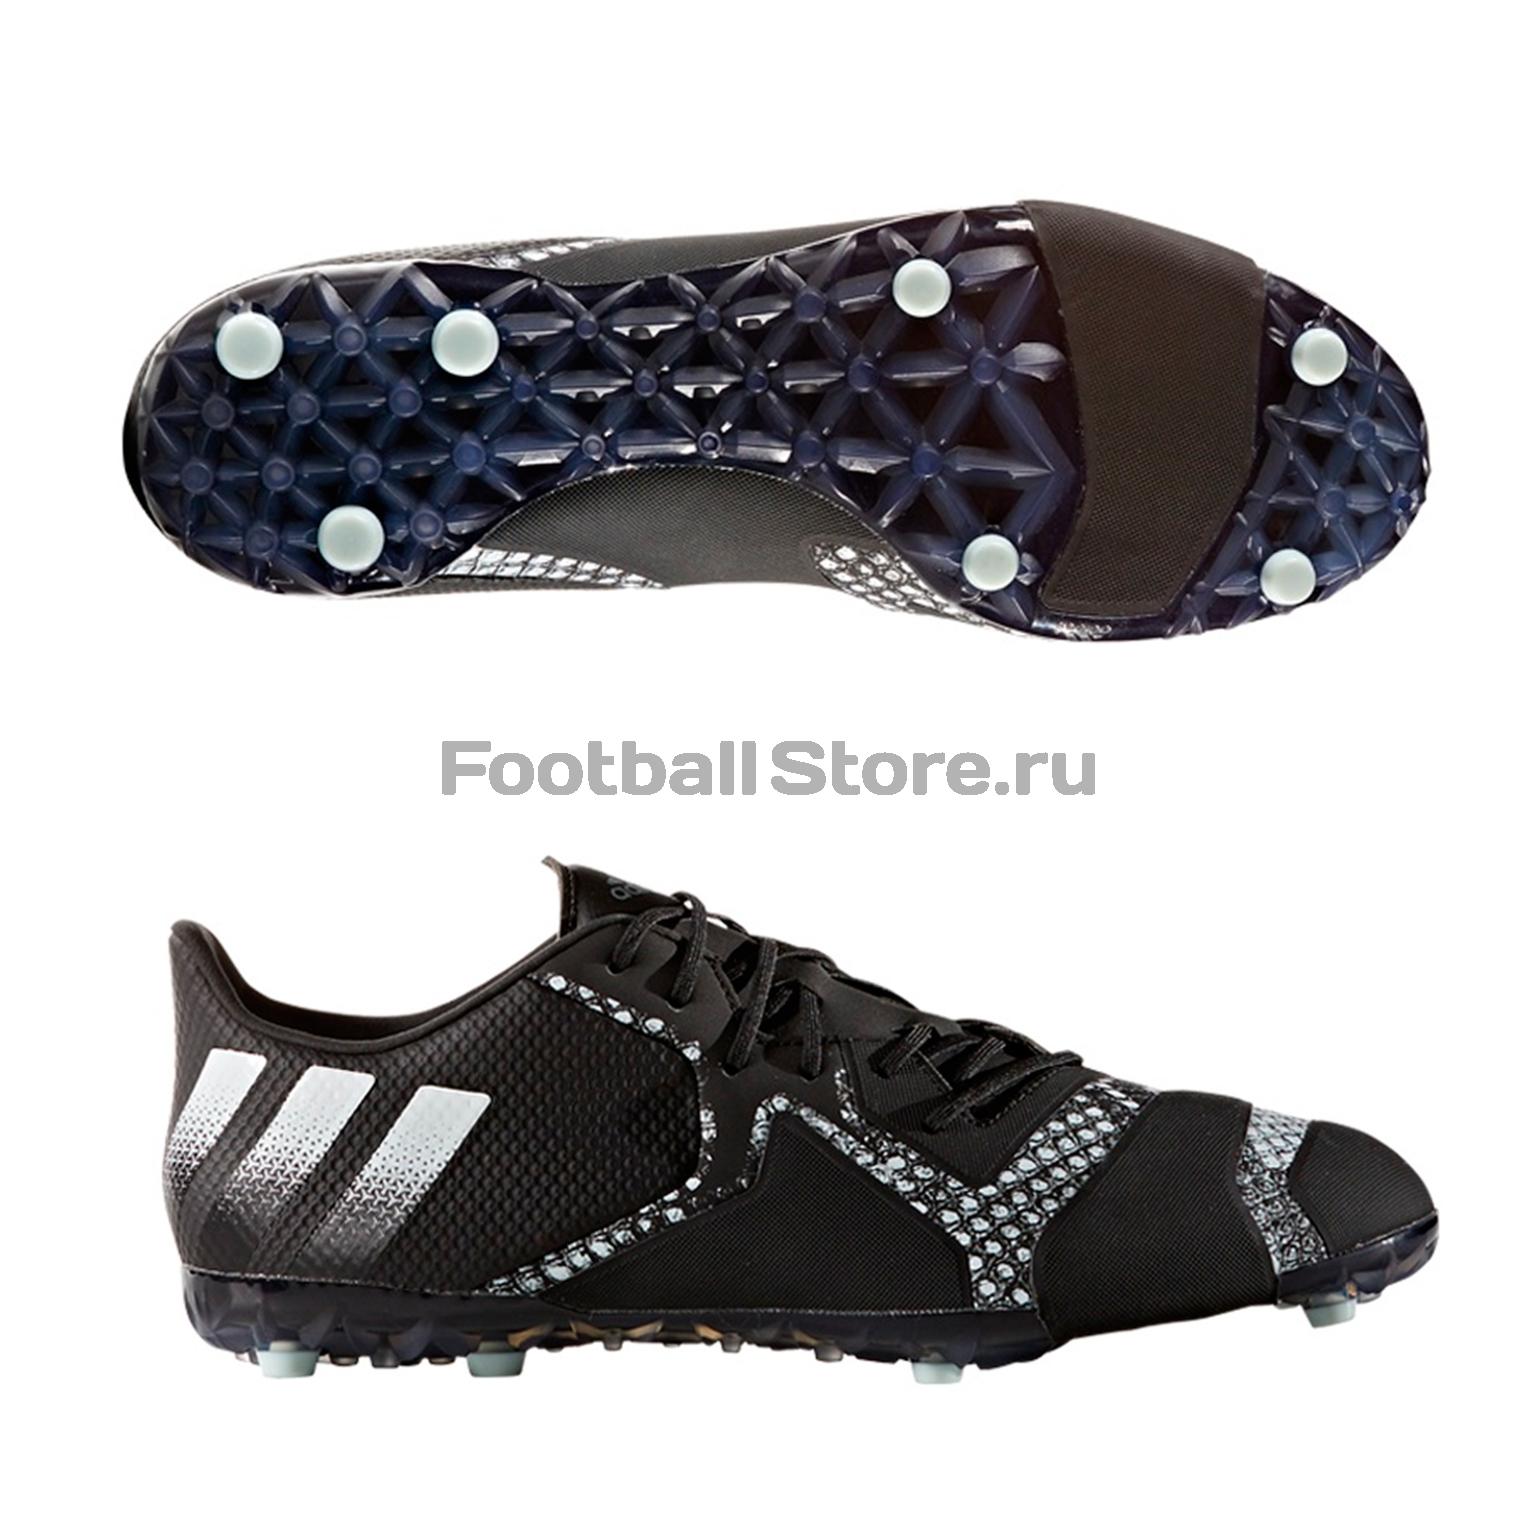 Шиповки Adidas Шиповки Adidas ACE 16+ TKRZ S31929 �������� adidas